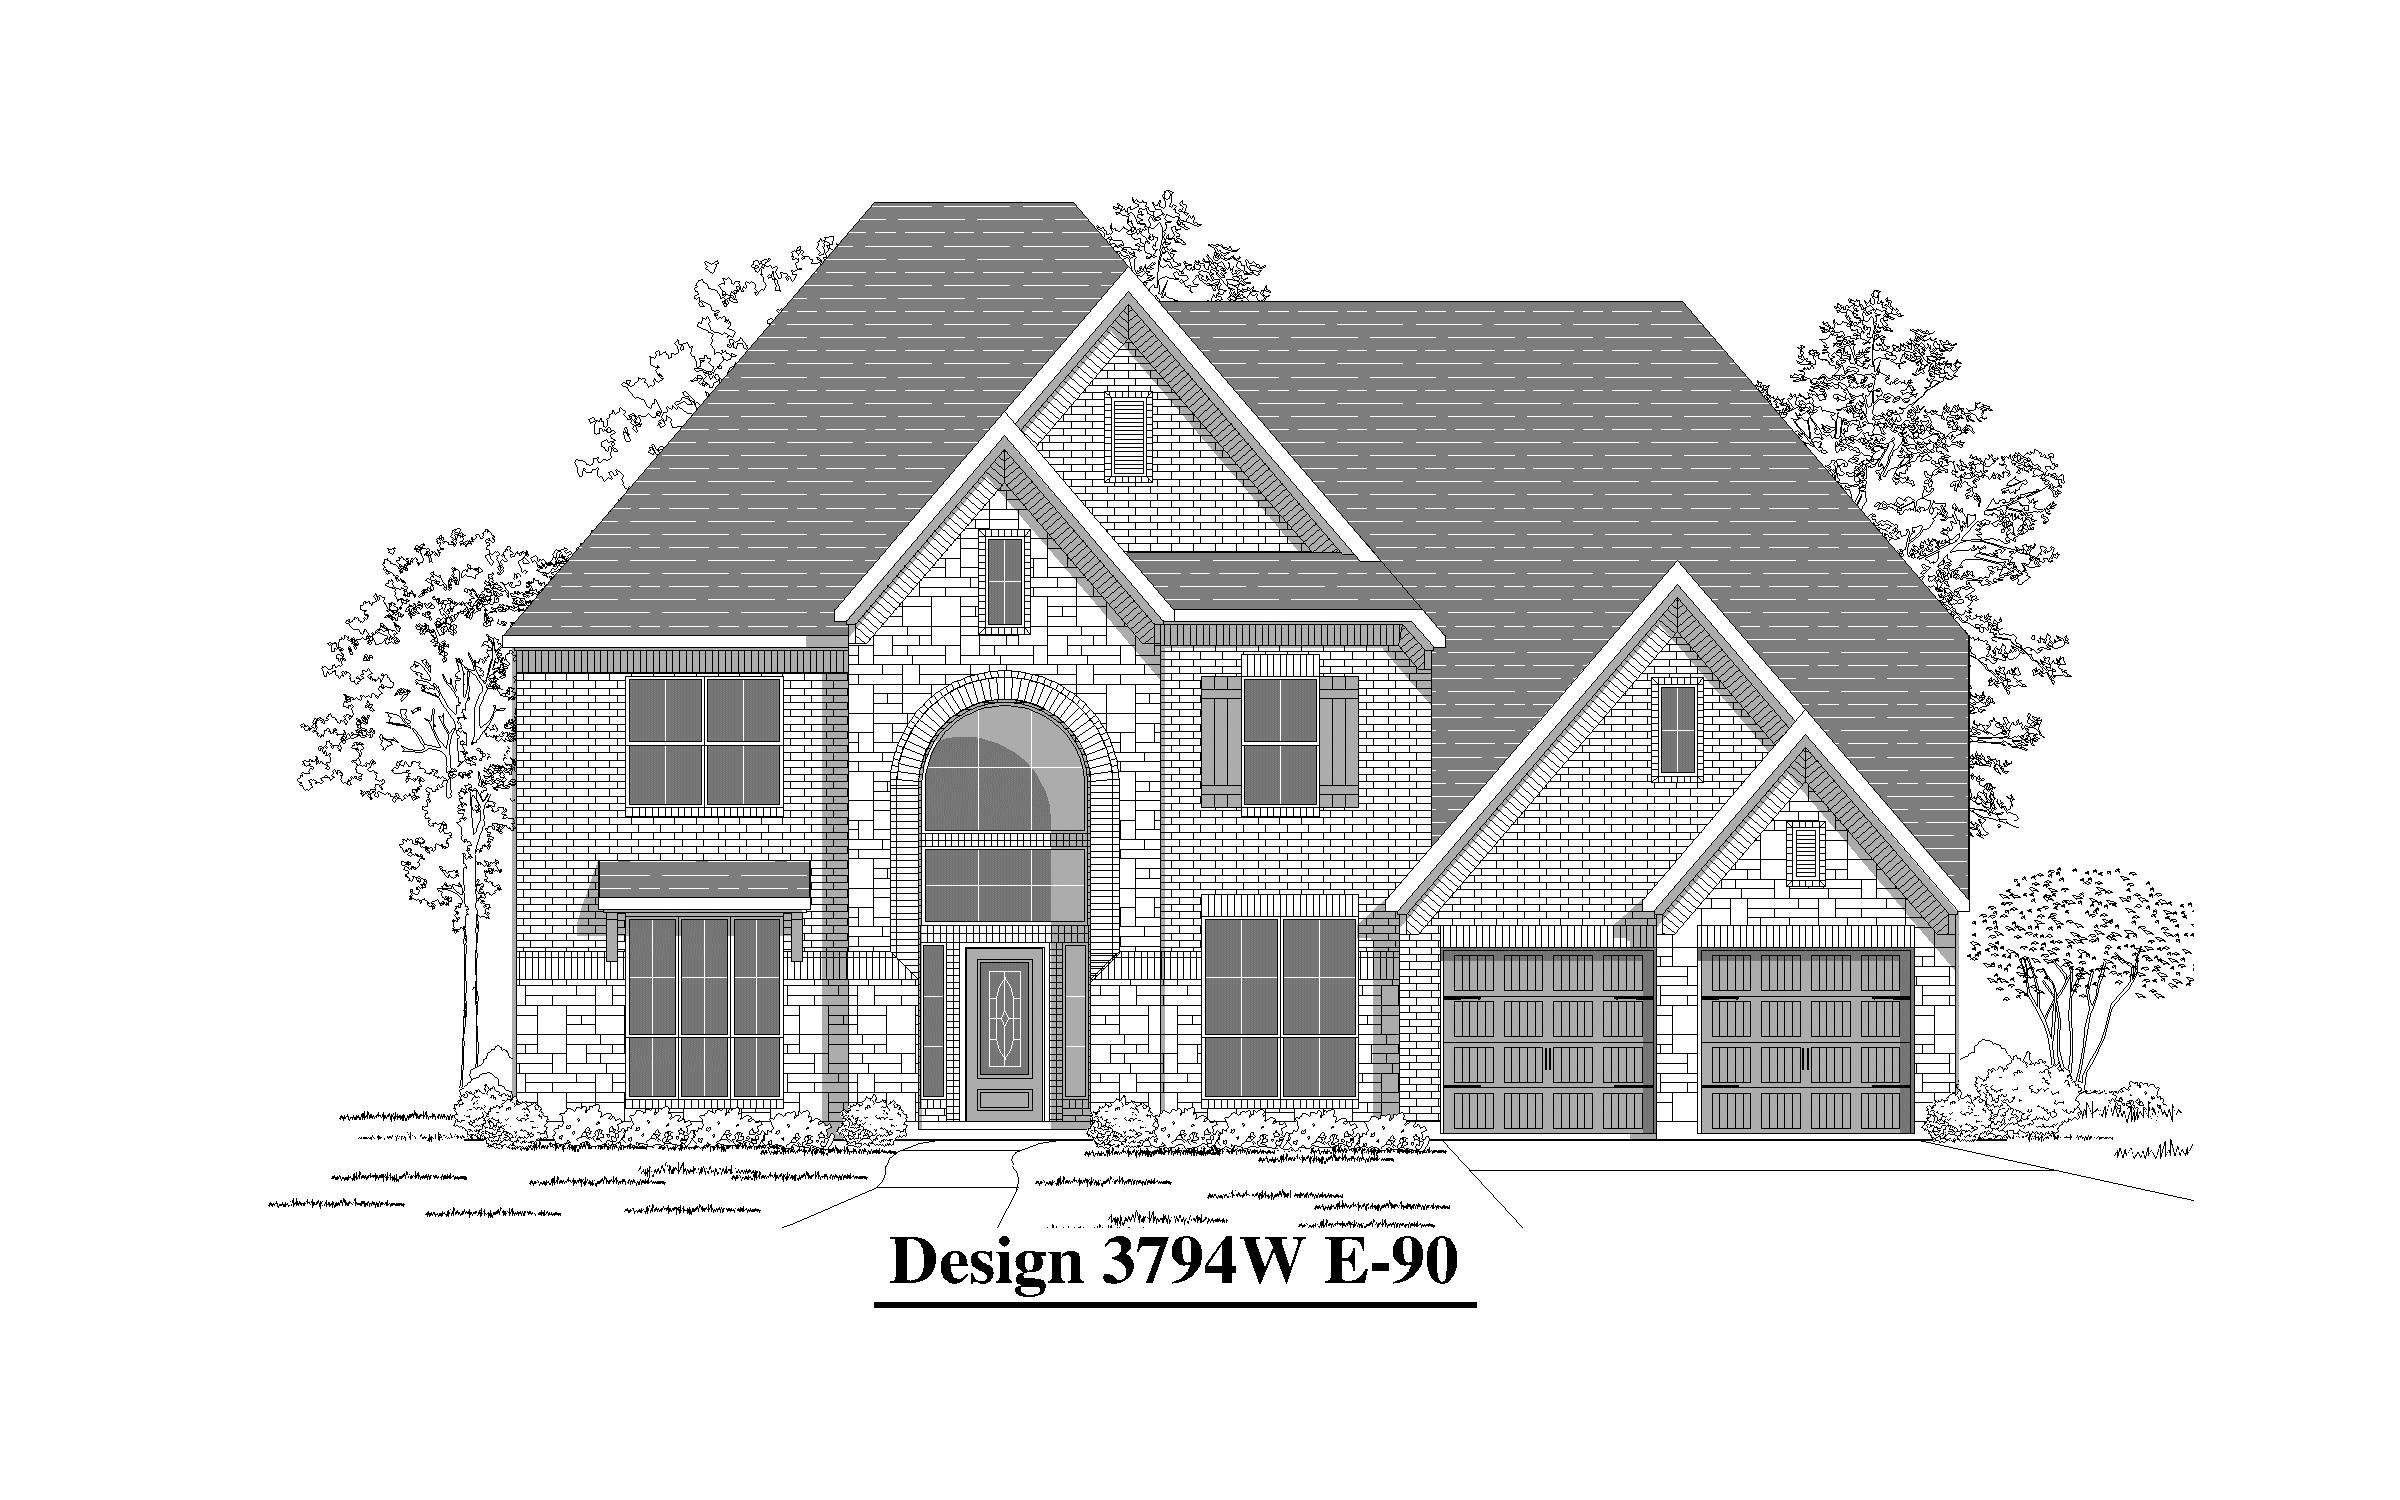 Single Family for Sale at Veranda 65' - 3794w 1242 Mystic River Lane Rosenberg, Texas 77471 United States